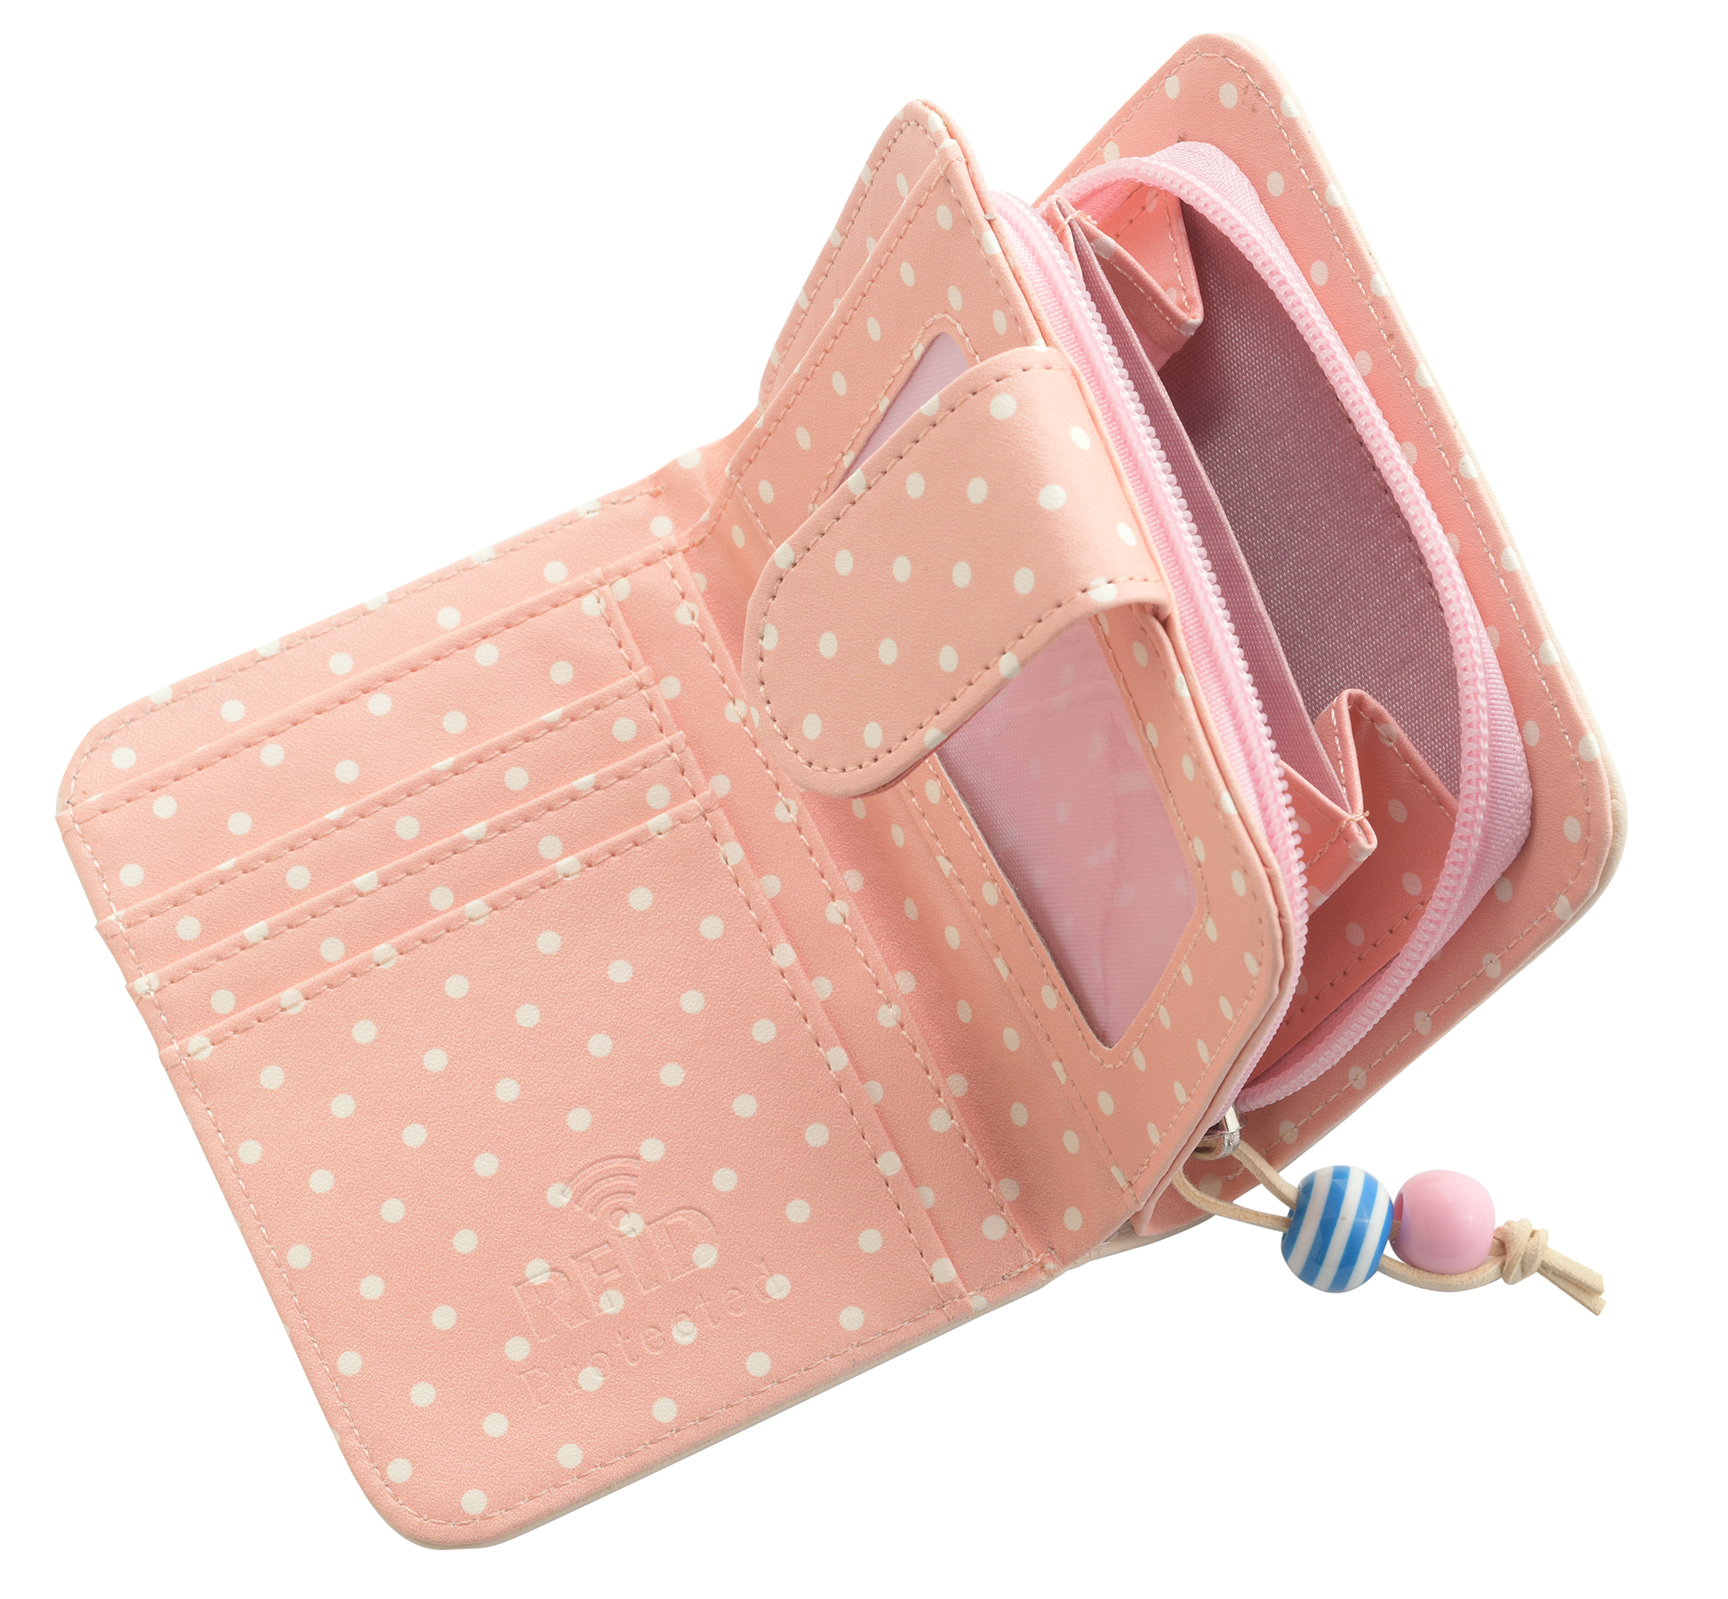 Mesdames-RFID-Bloquant-Petites-En-Faux-Cuir-Polka-Dot-Sac-zippee miniature 9